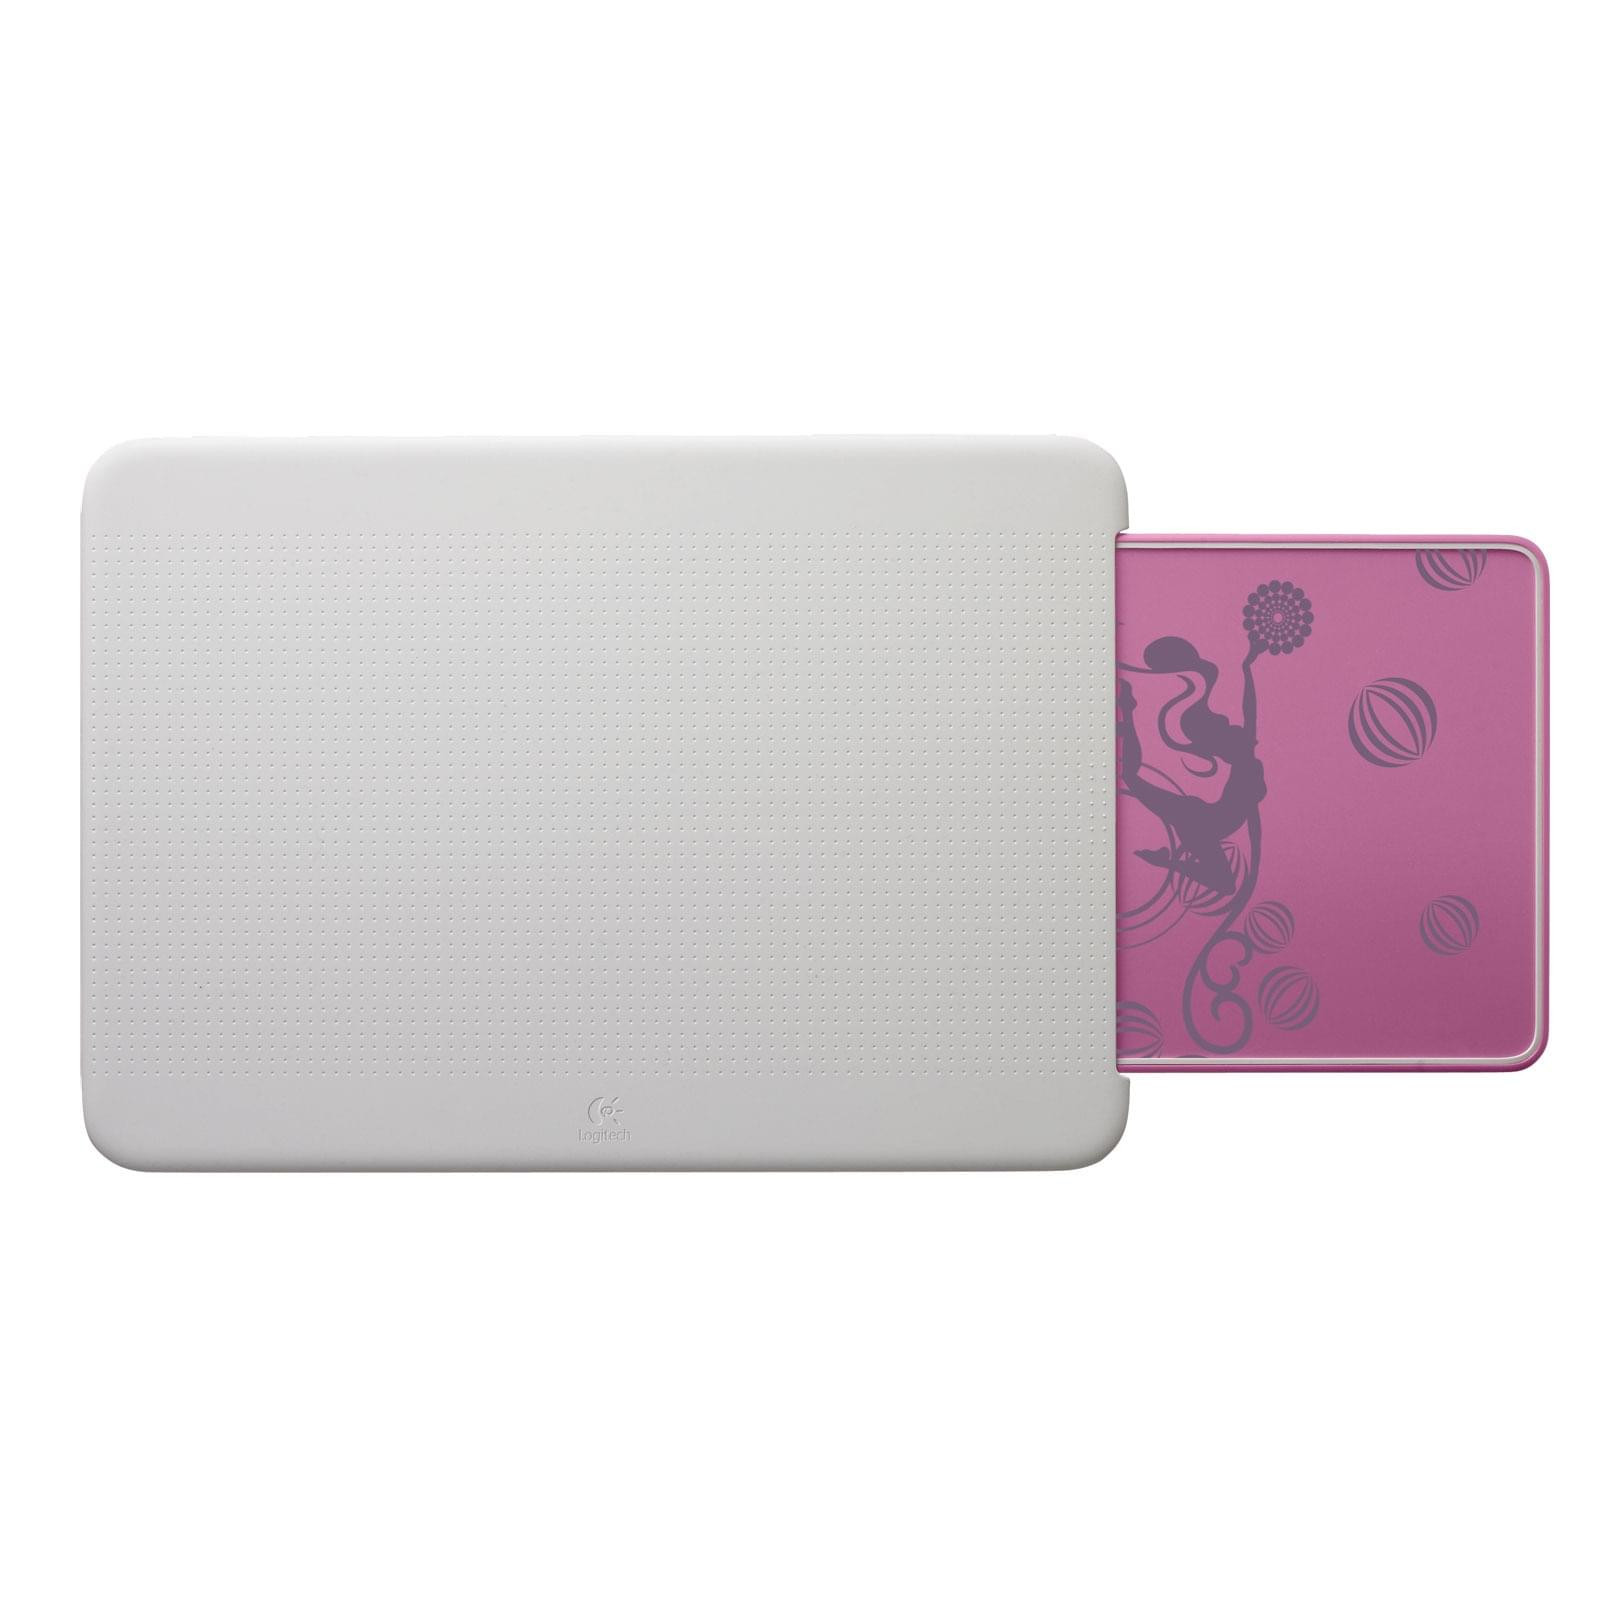 Comfort Lapdesk N315 Pink Balance - Logitech - 0